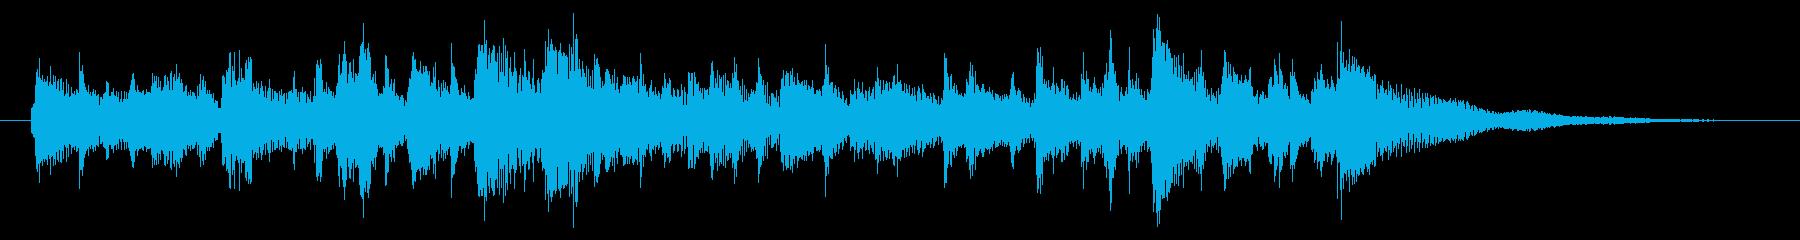 A refreshing and gentle bossa nova jingle's reproduced waveform